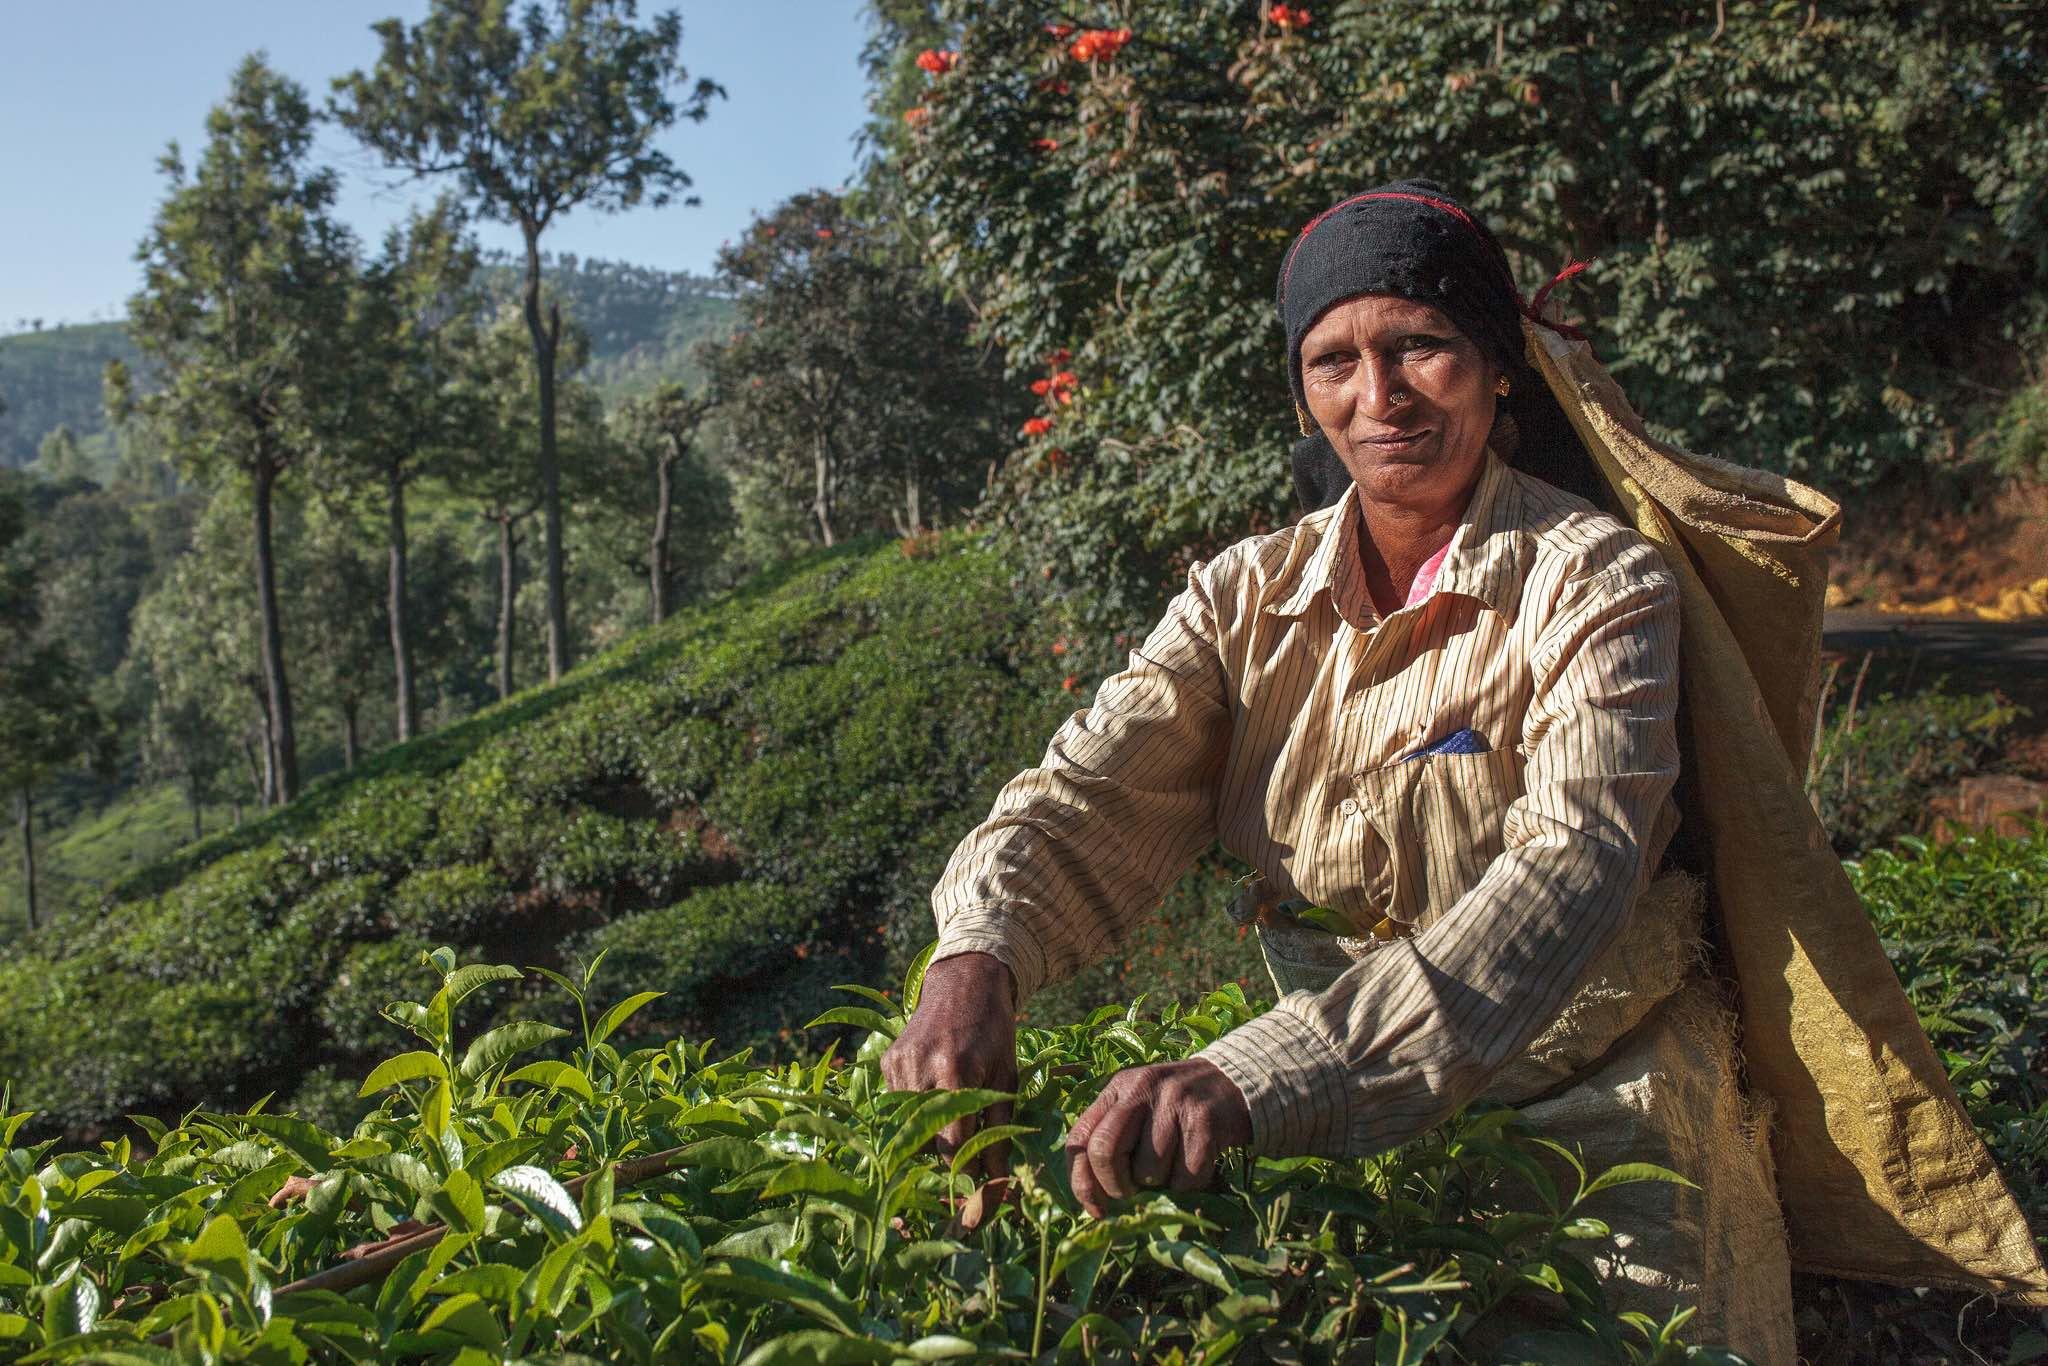 India Tea Plucker in Nilgiri, Tamil Nadu named Saroja, a tea plantation worker at Woodlands Estate. Photo credit: Sara Hylton